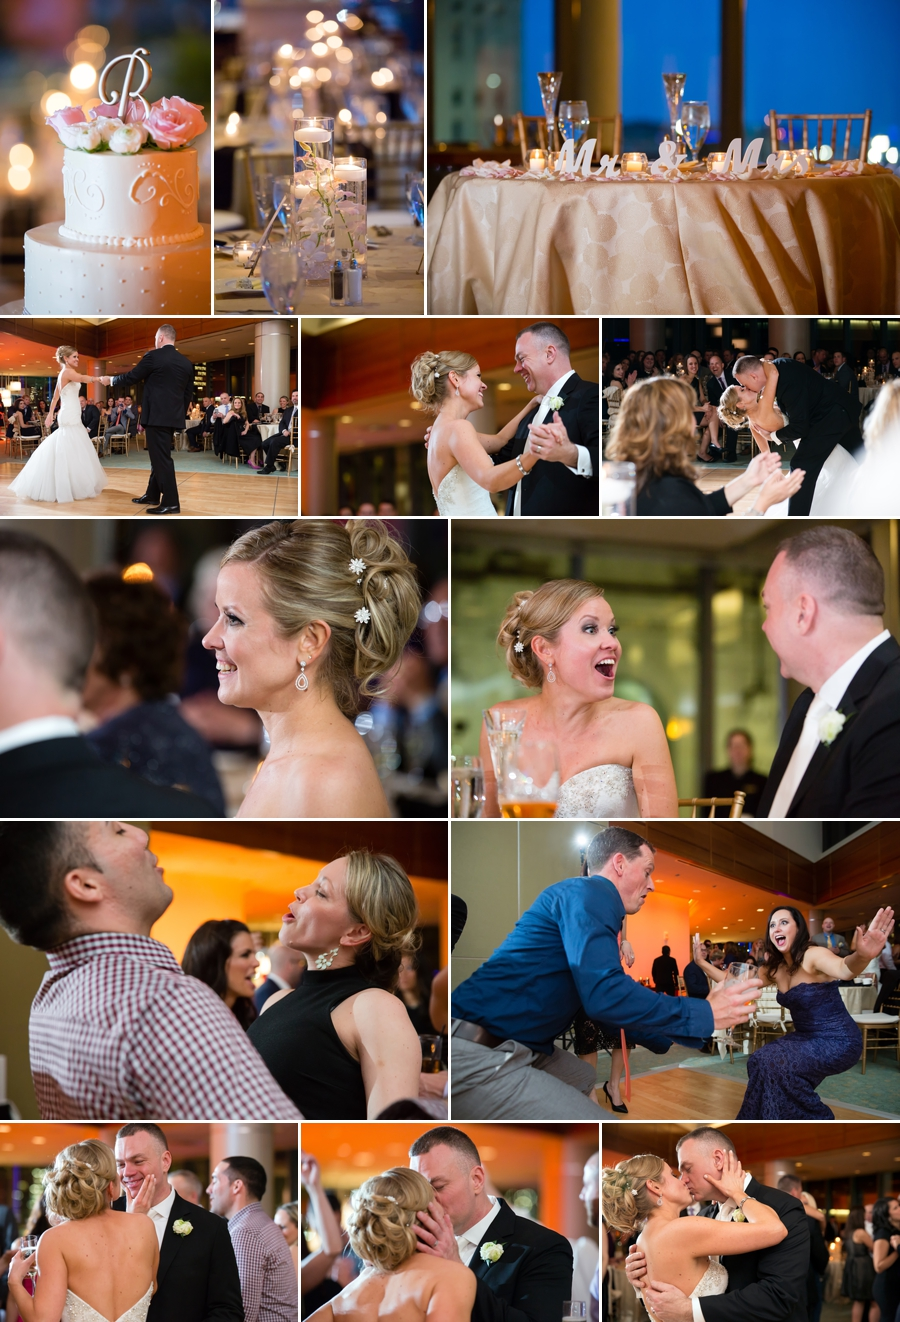 wedding reception image collage